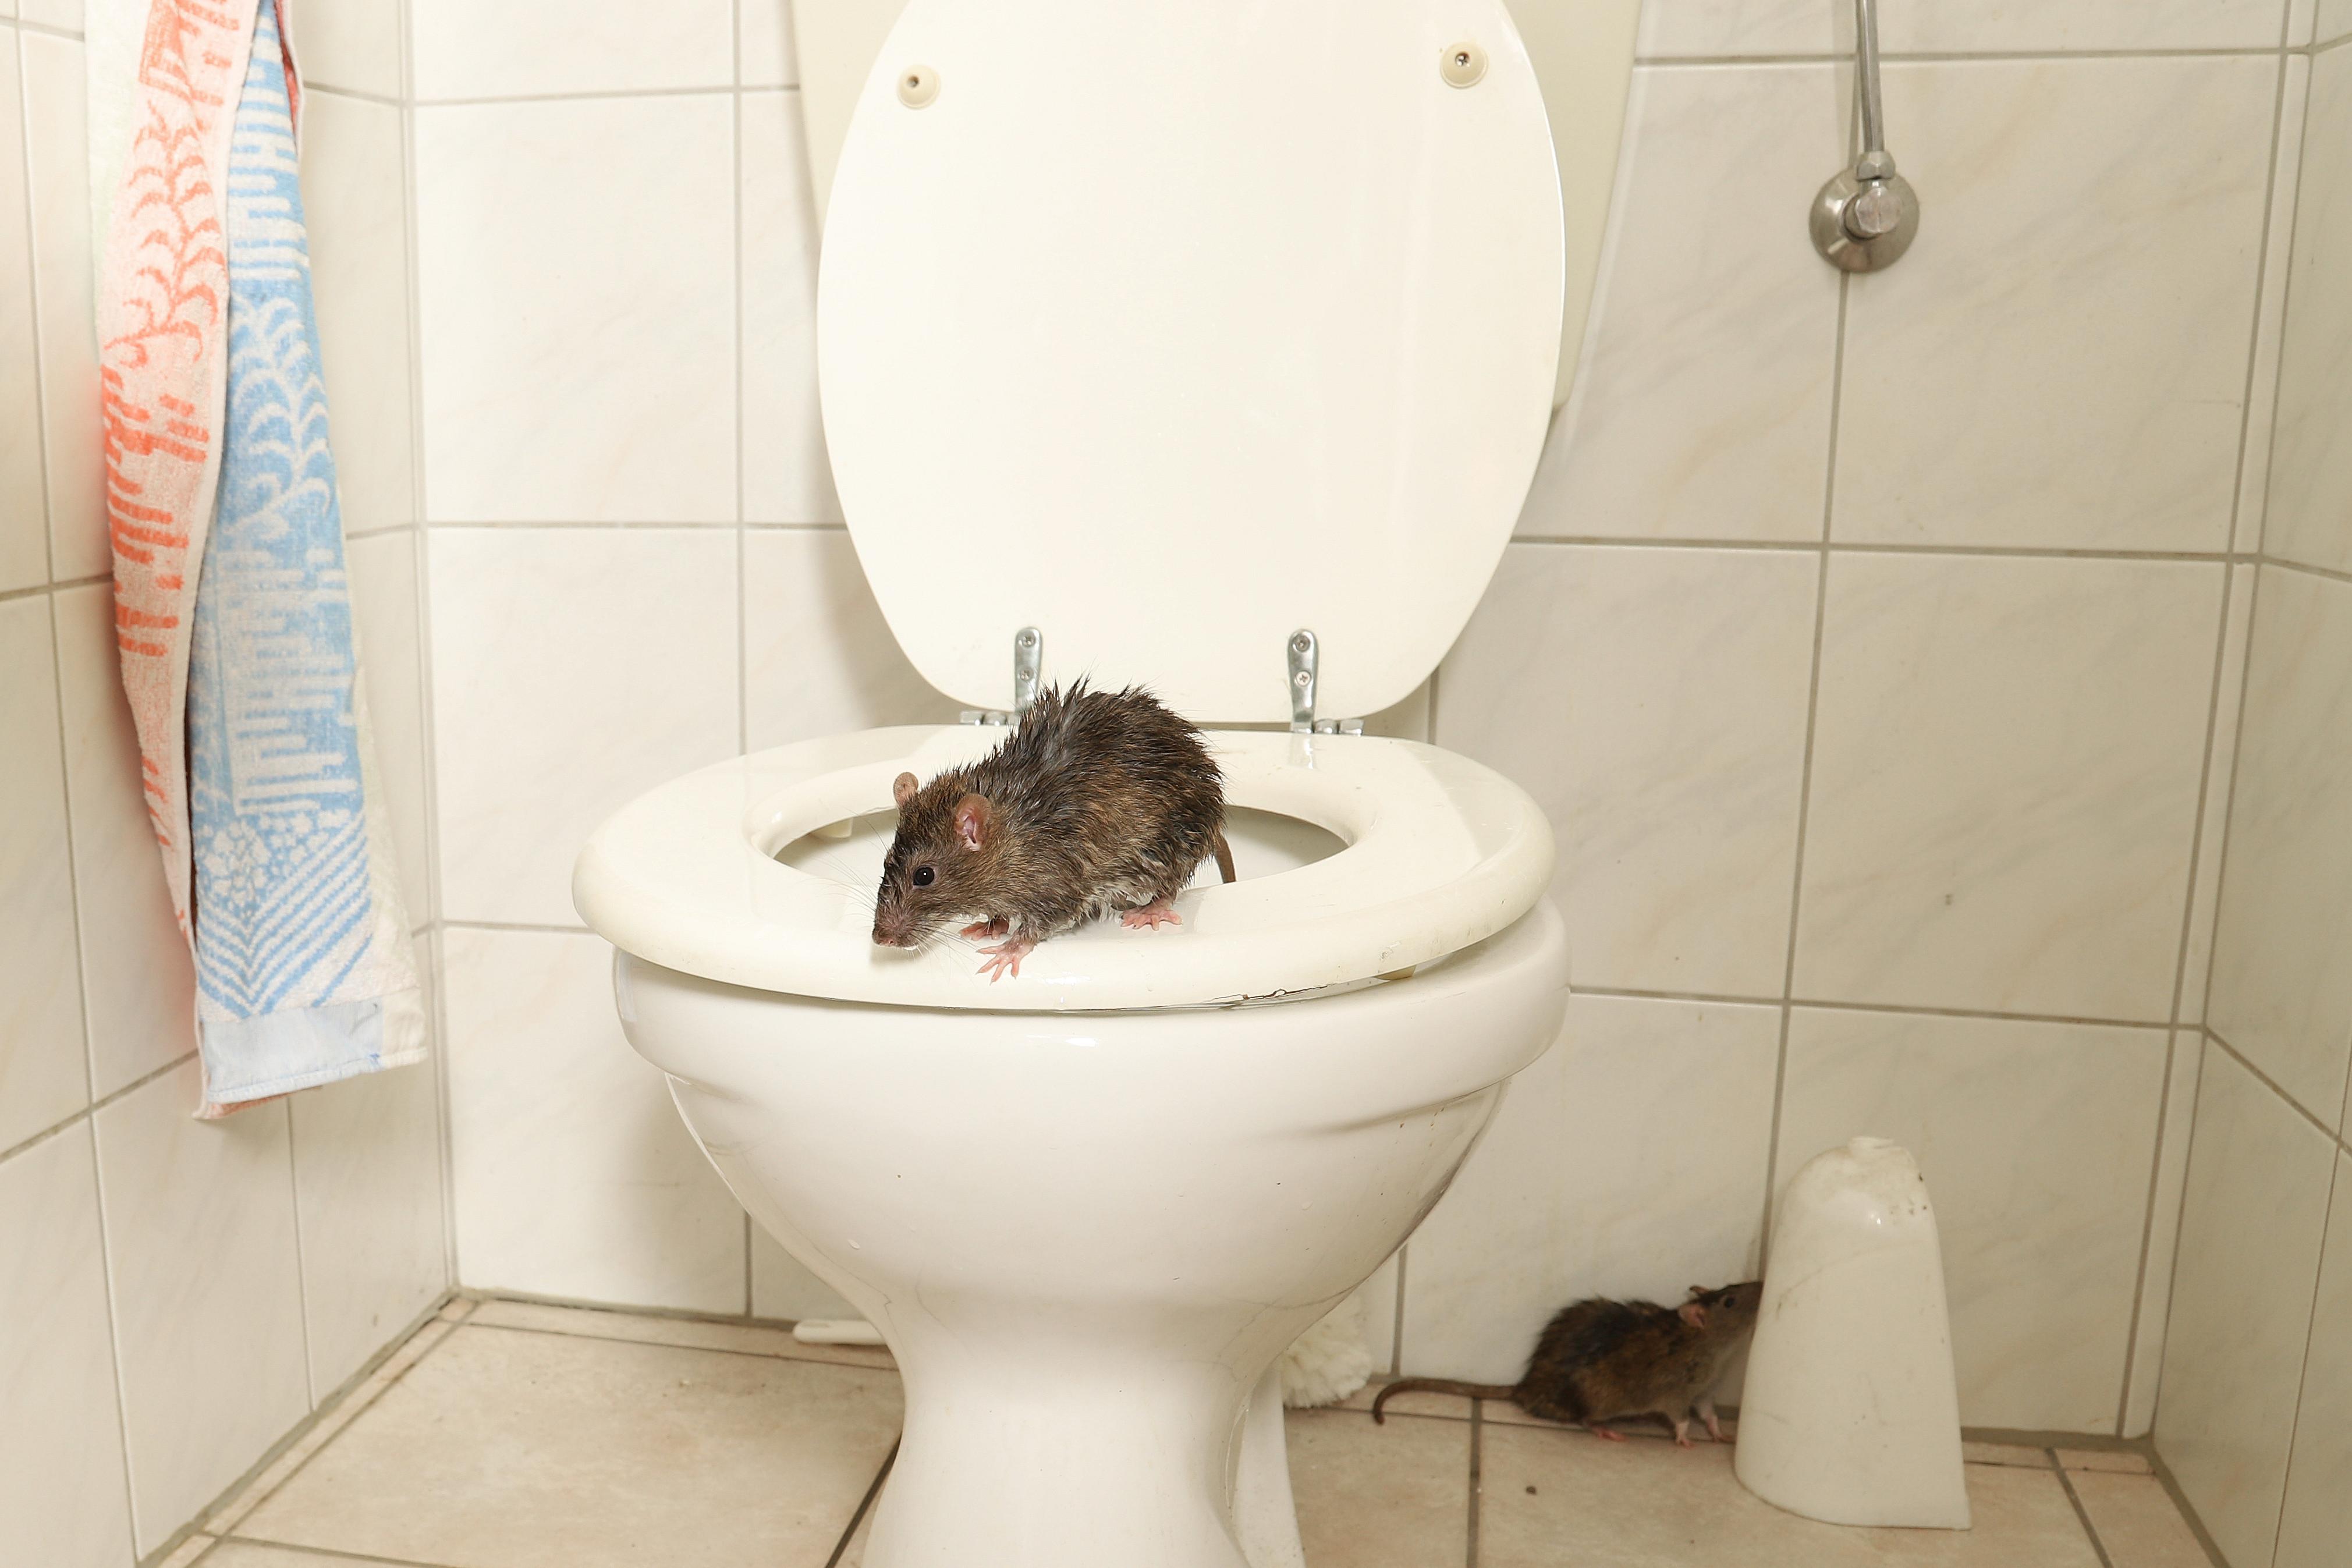 Rotte toilet